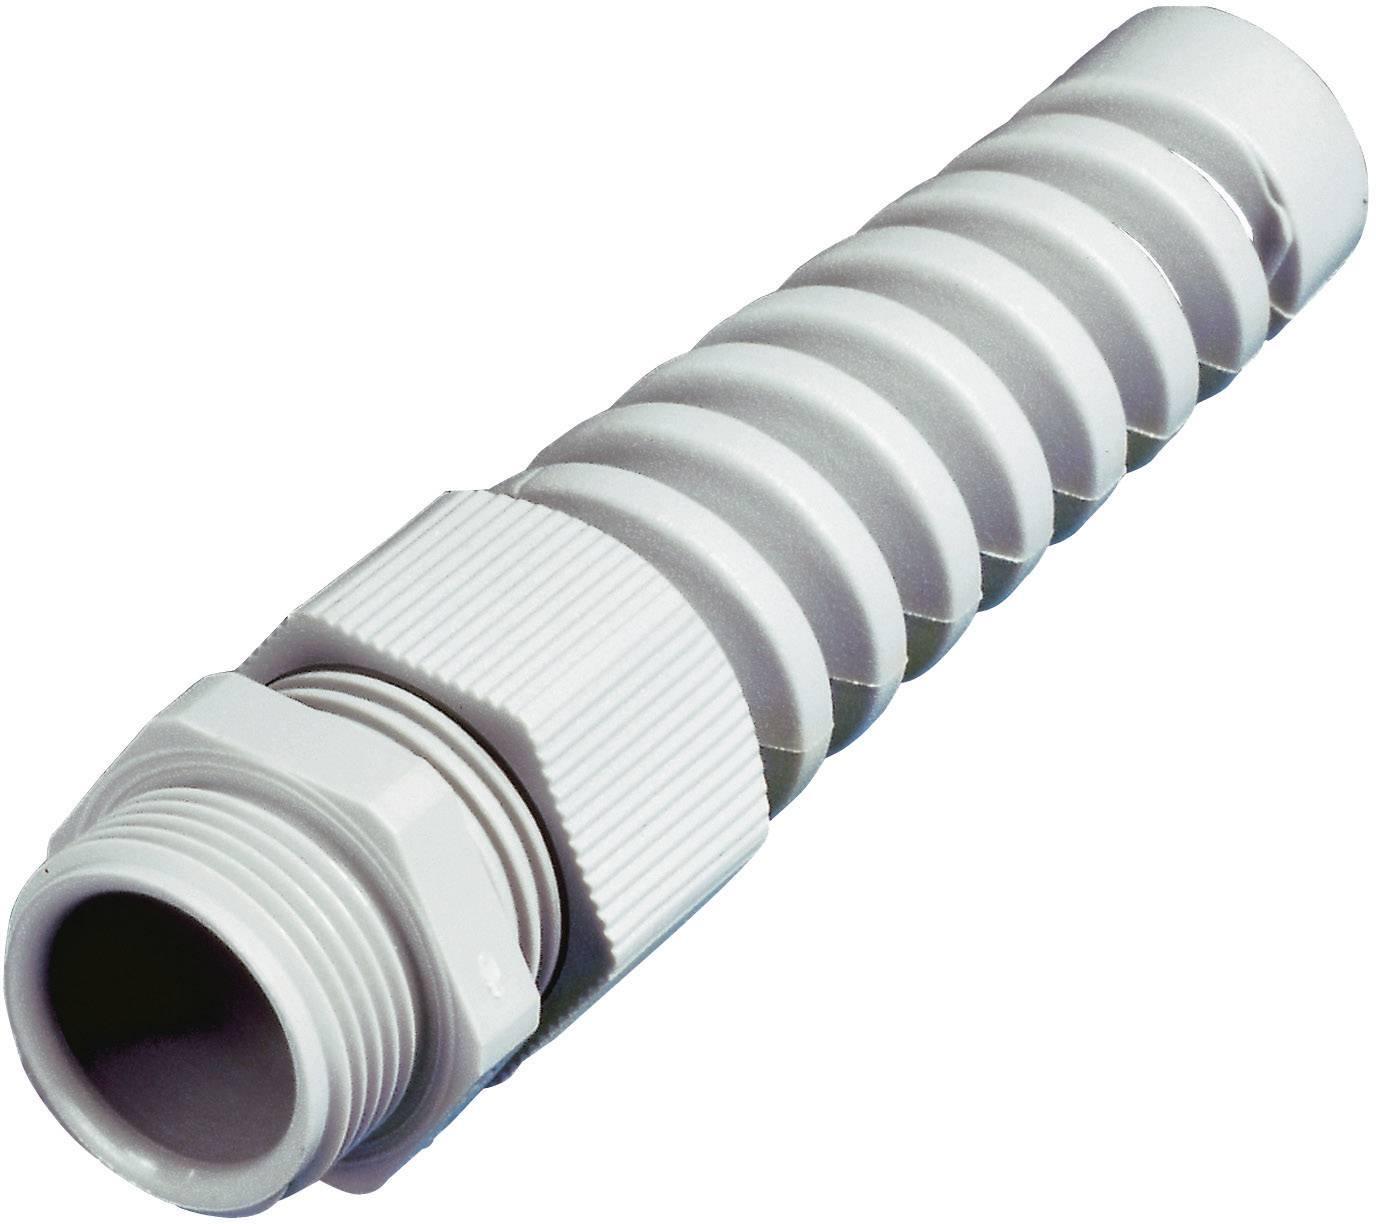 Káblová priechodka Wiska ESKVS M20 RAL 9005, polyamid, čierna, 1 ks